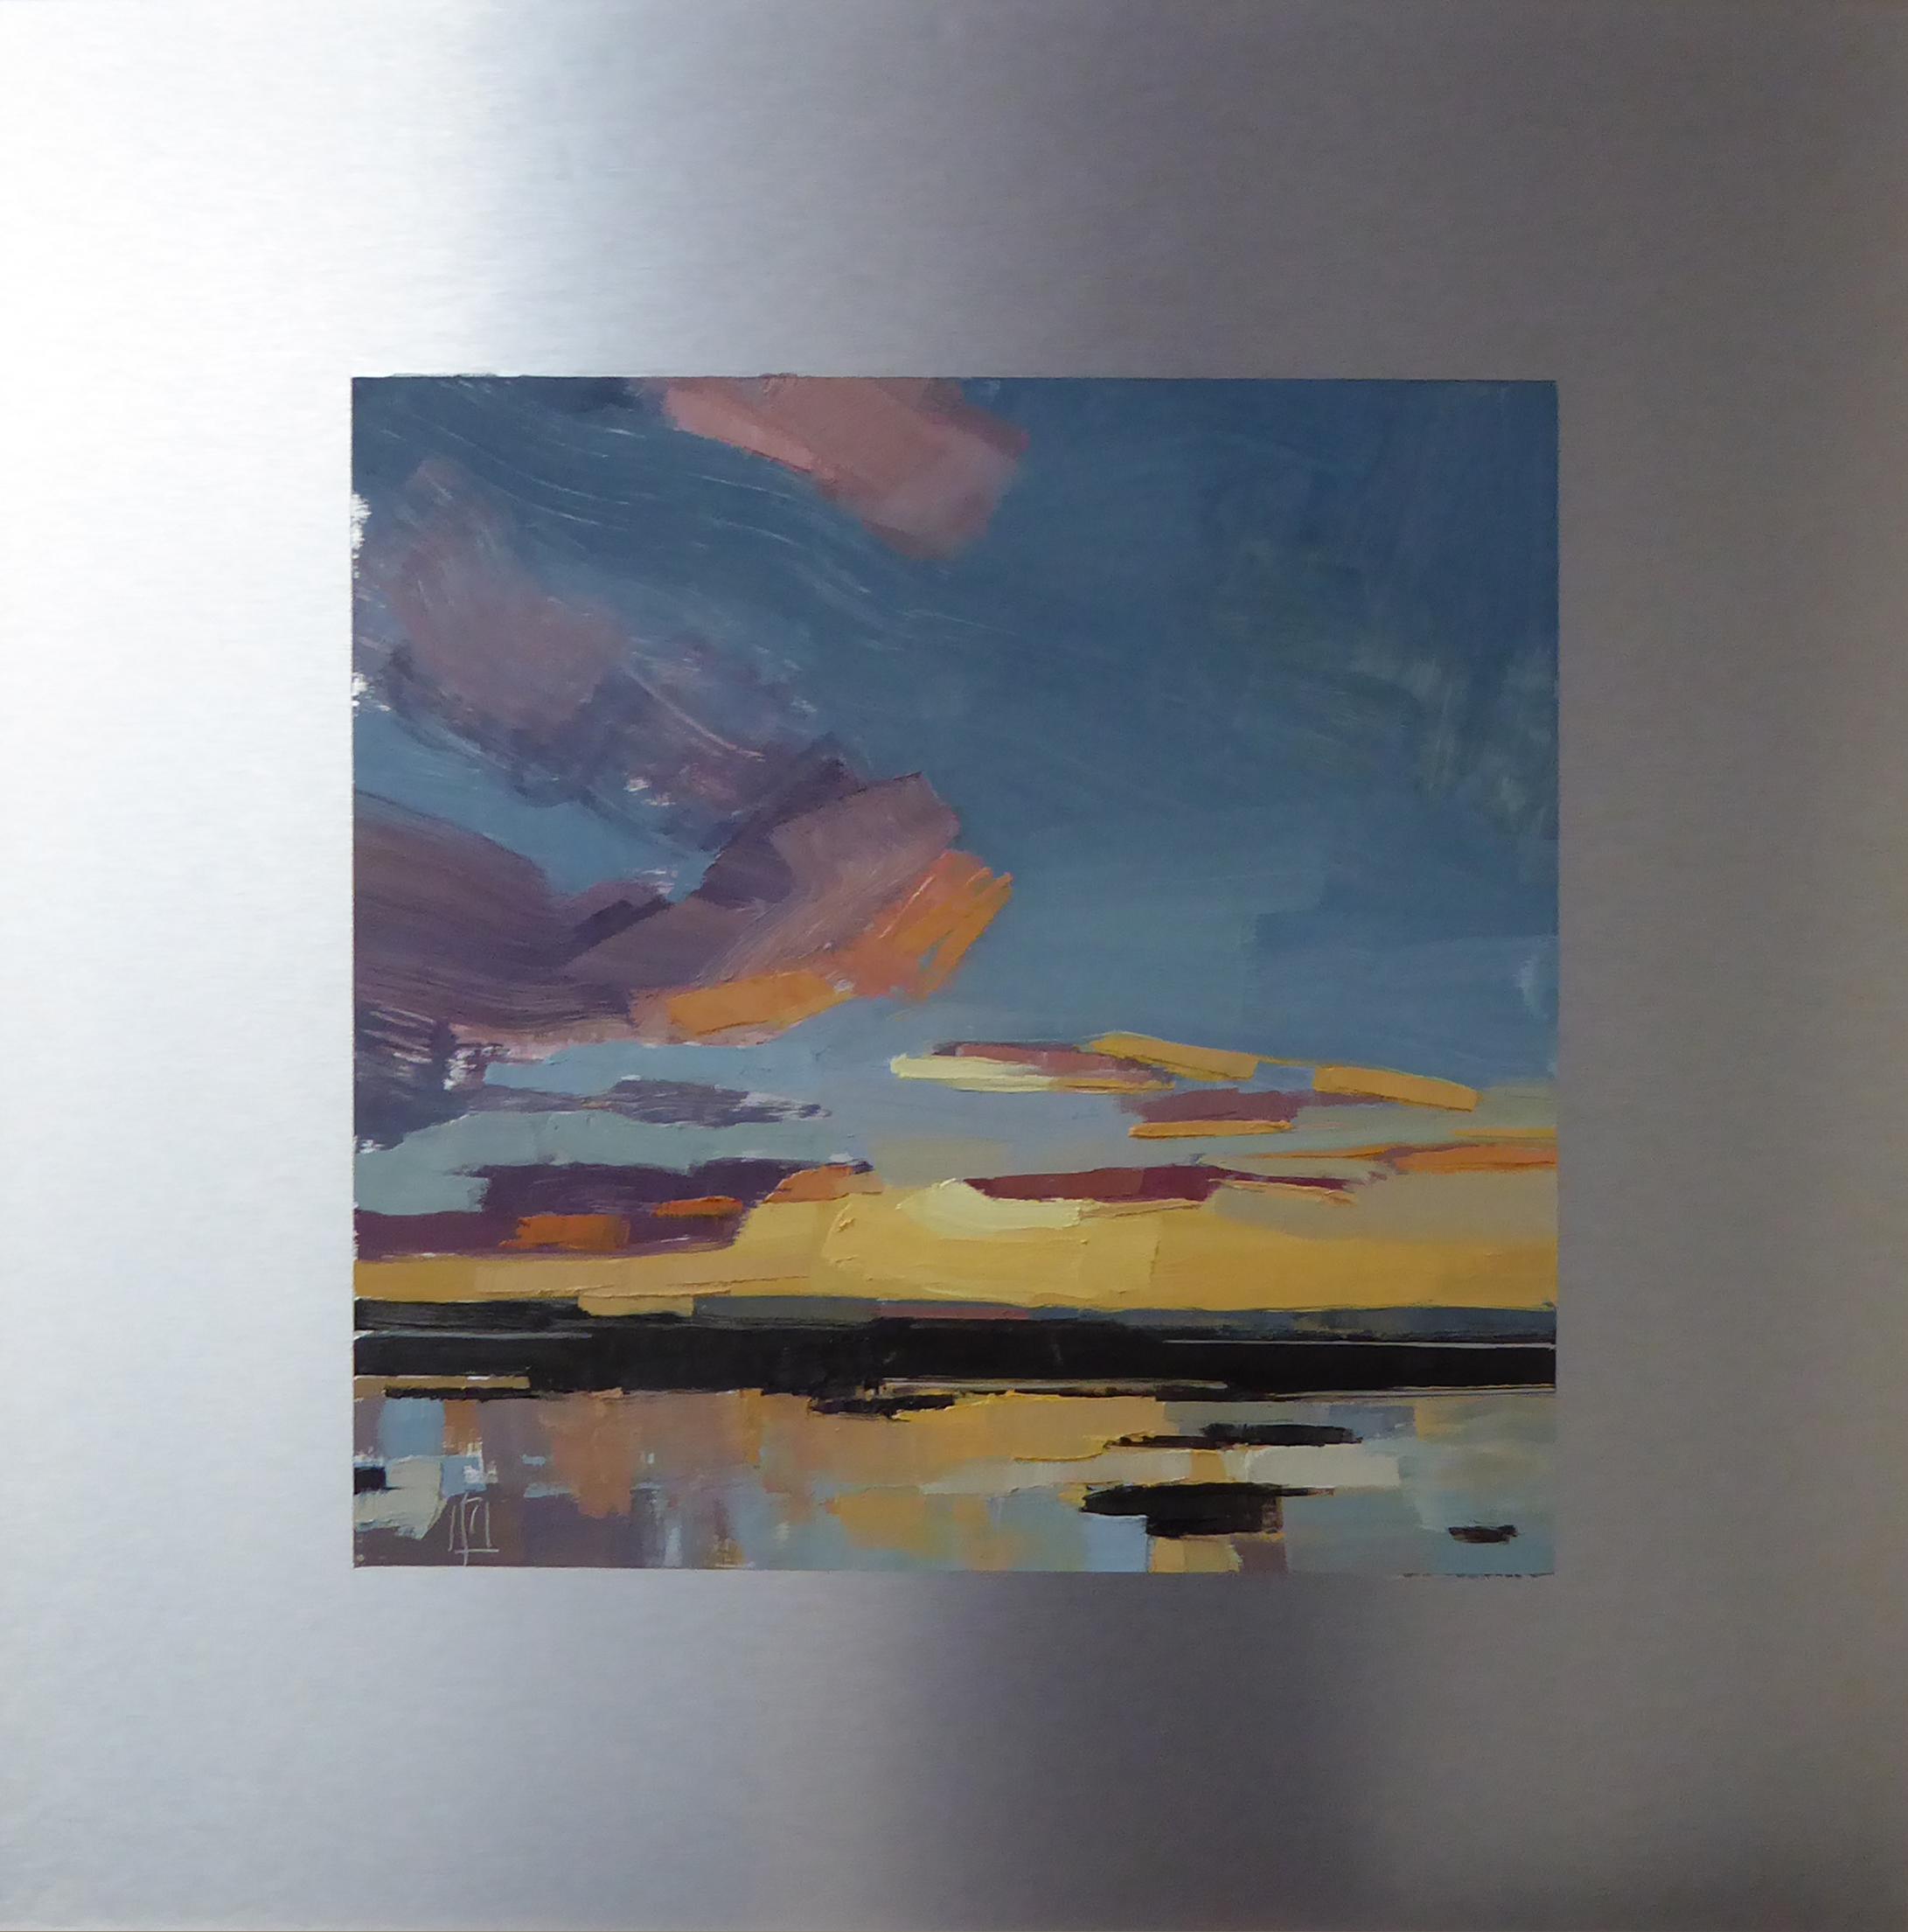 Plum Island, West  12 x 12 on 20 x 20 alum panel   Islesford Artists Gallery   sold